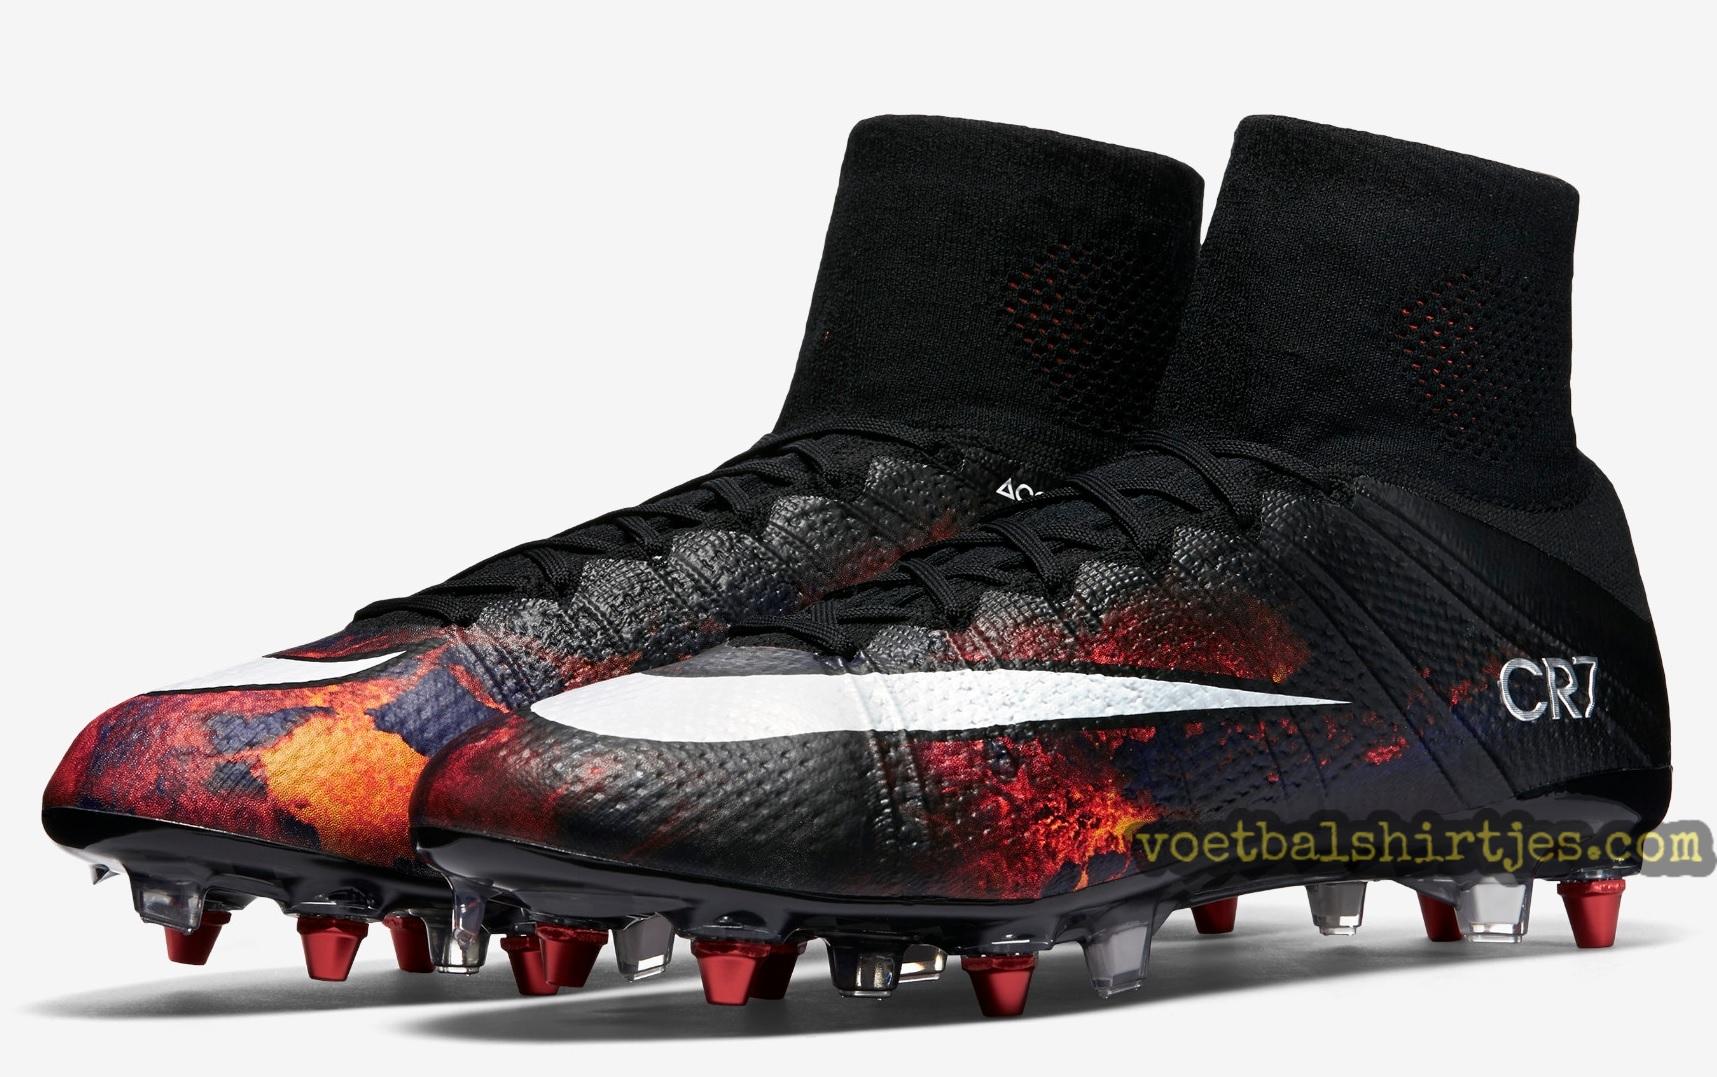 Nike Mercurial Superfly CR7 Lava Ronaldo voetbalschoenen